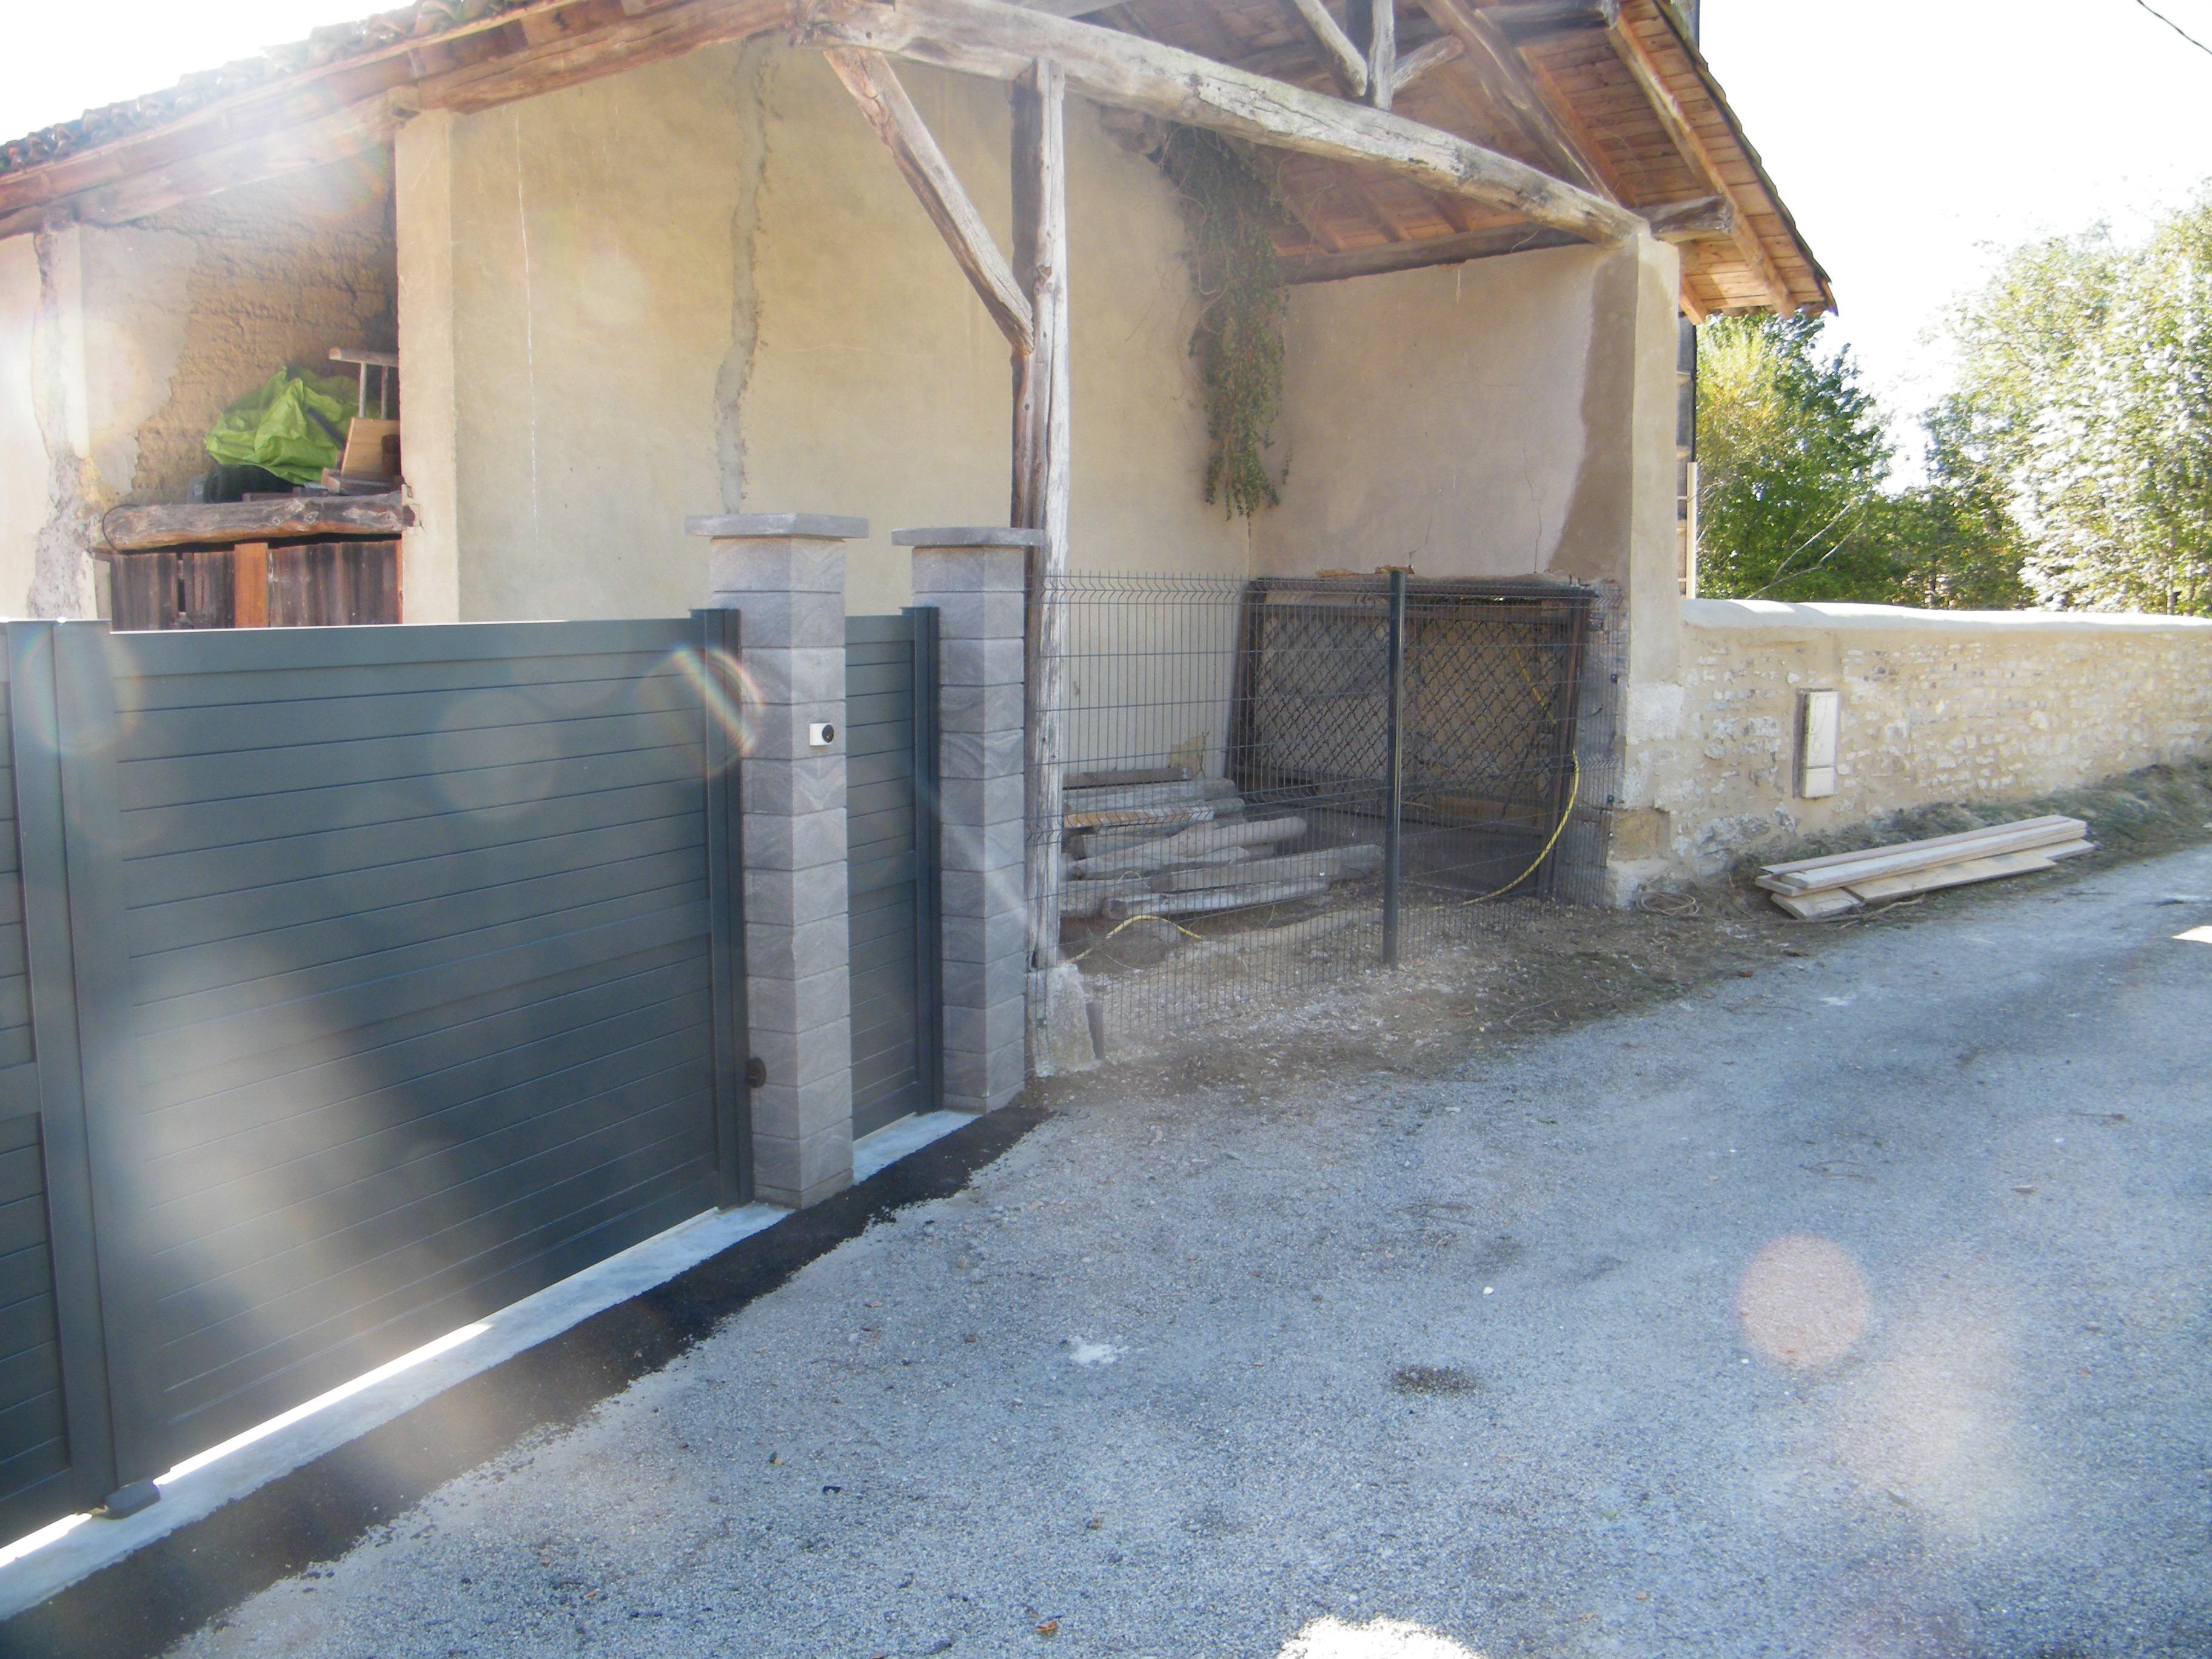 Pose d'un portail aluminium - 01370 TREFFORT CUISIAT